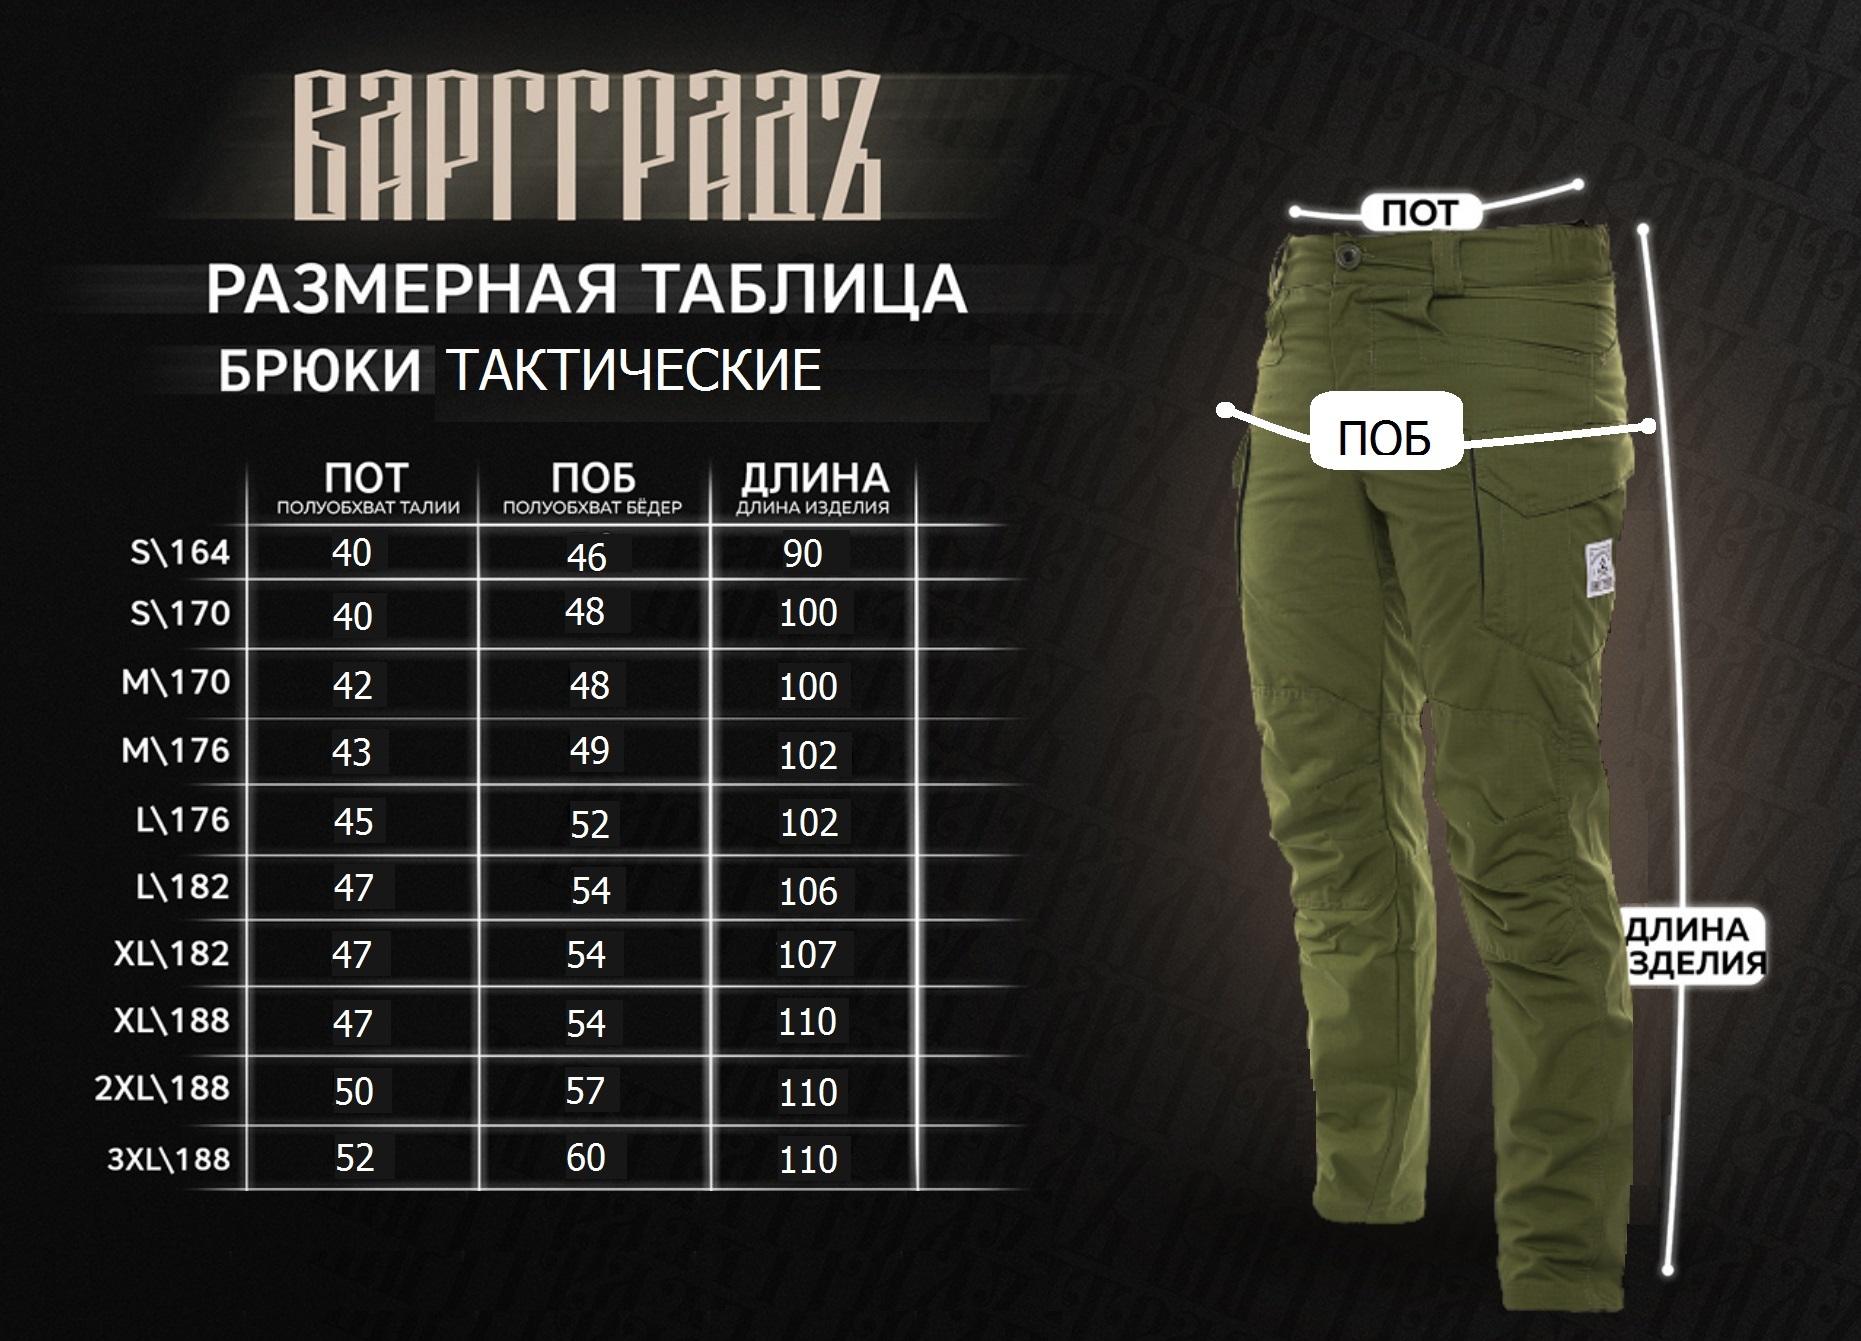 Брюки Тактические Варгградъ мужские олива green Рип-Стоп